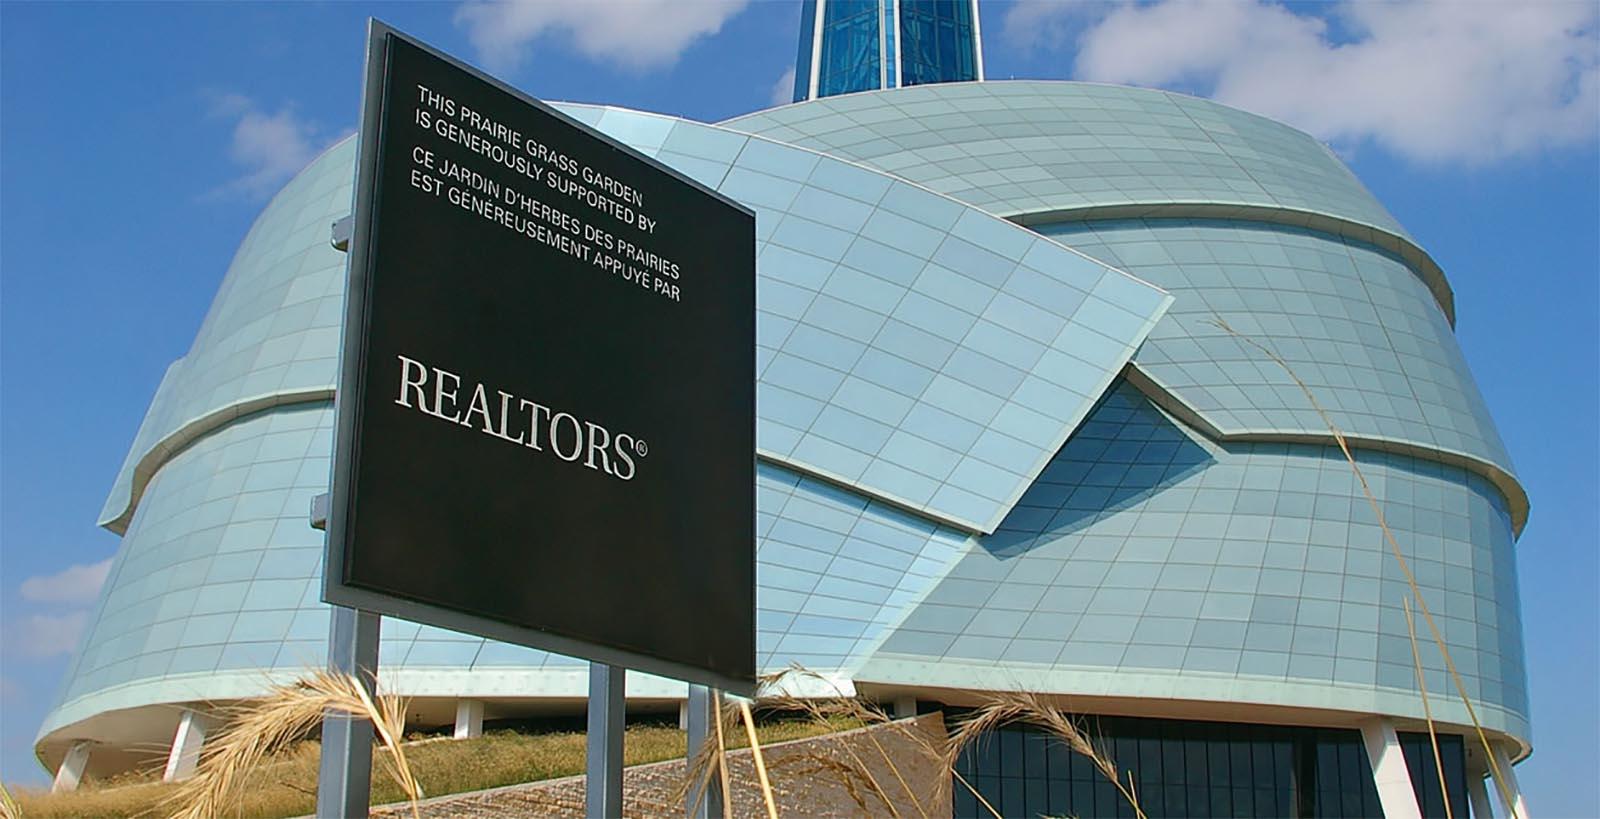 Canadian Museum Entrance Signage